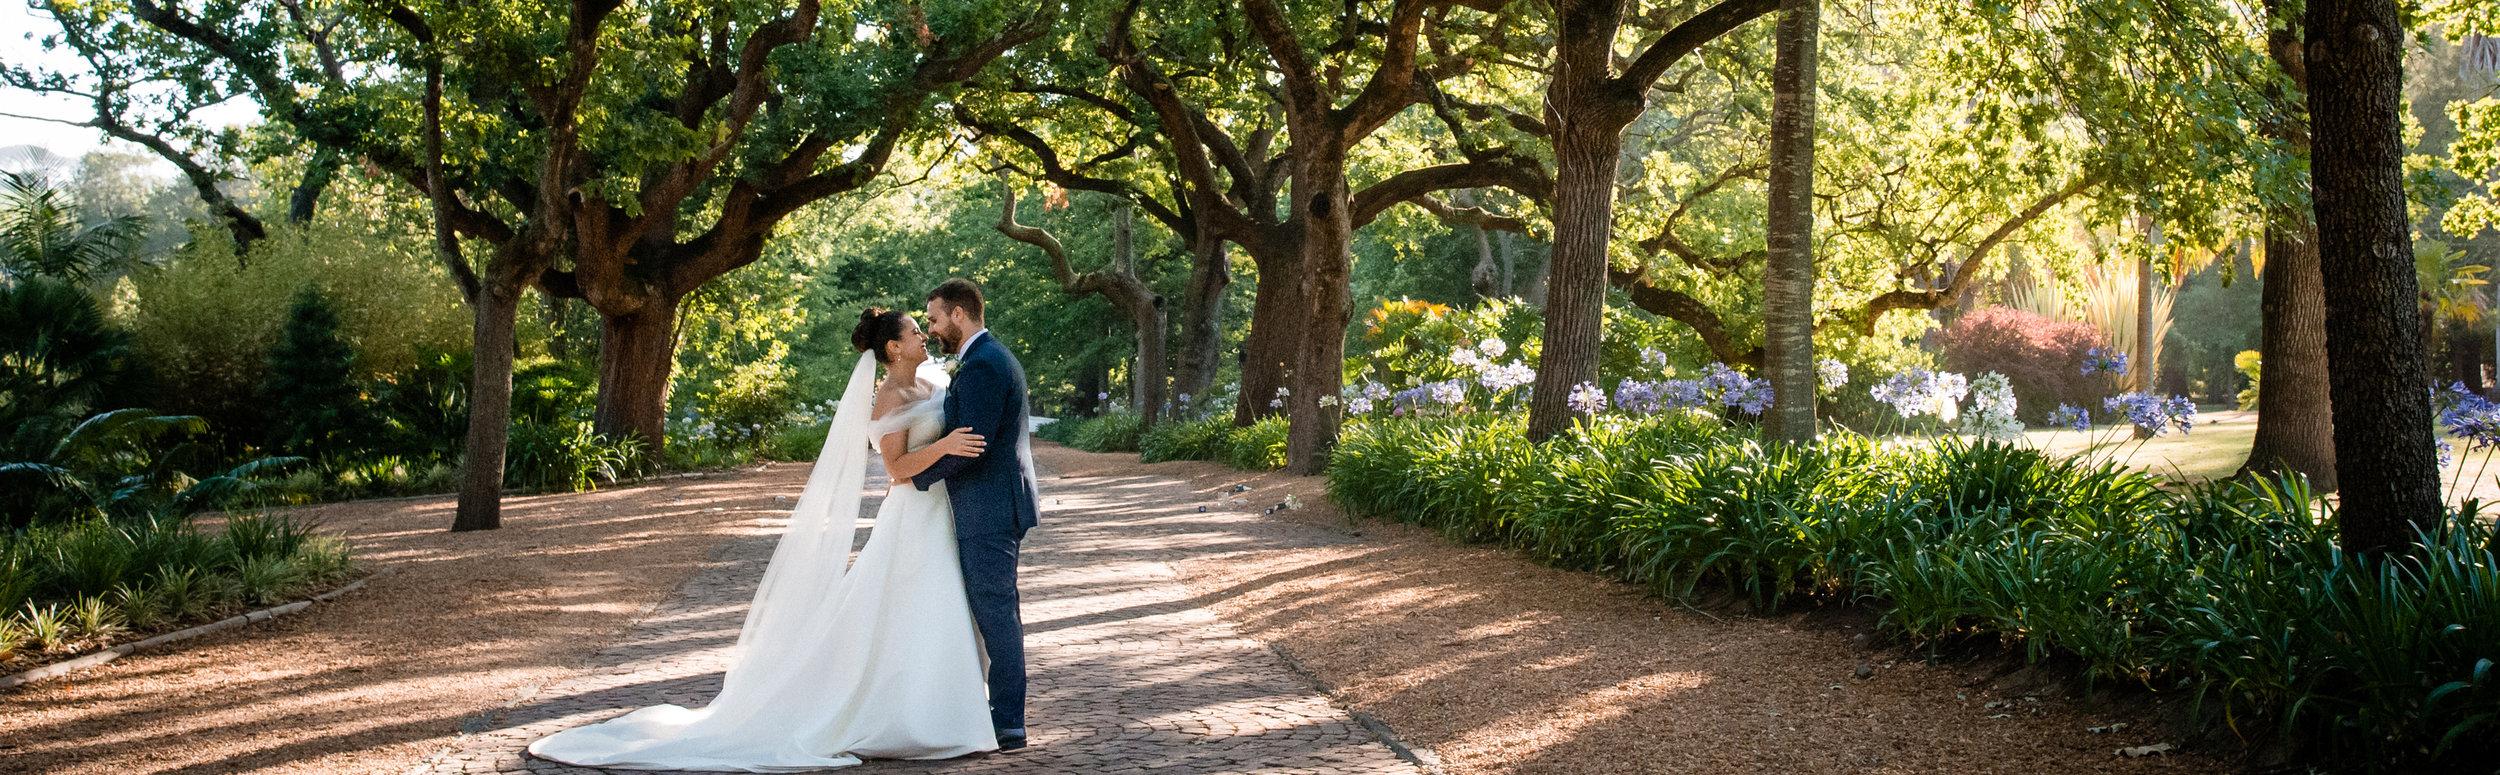 Tina Braz & Greg De Mink Wedding 2018.jpg